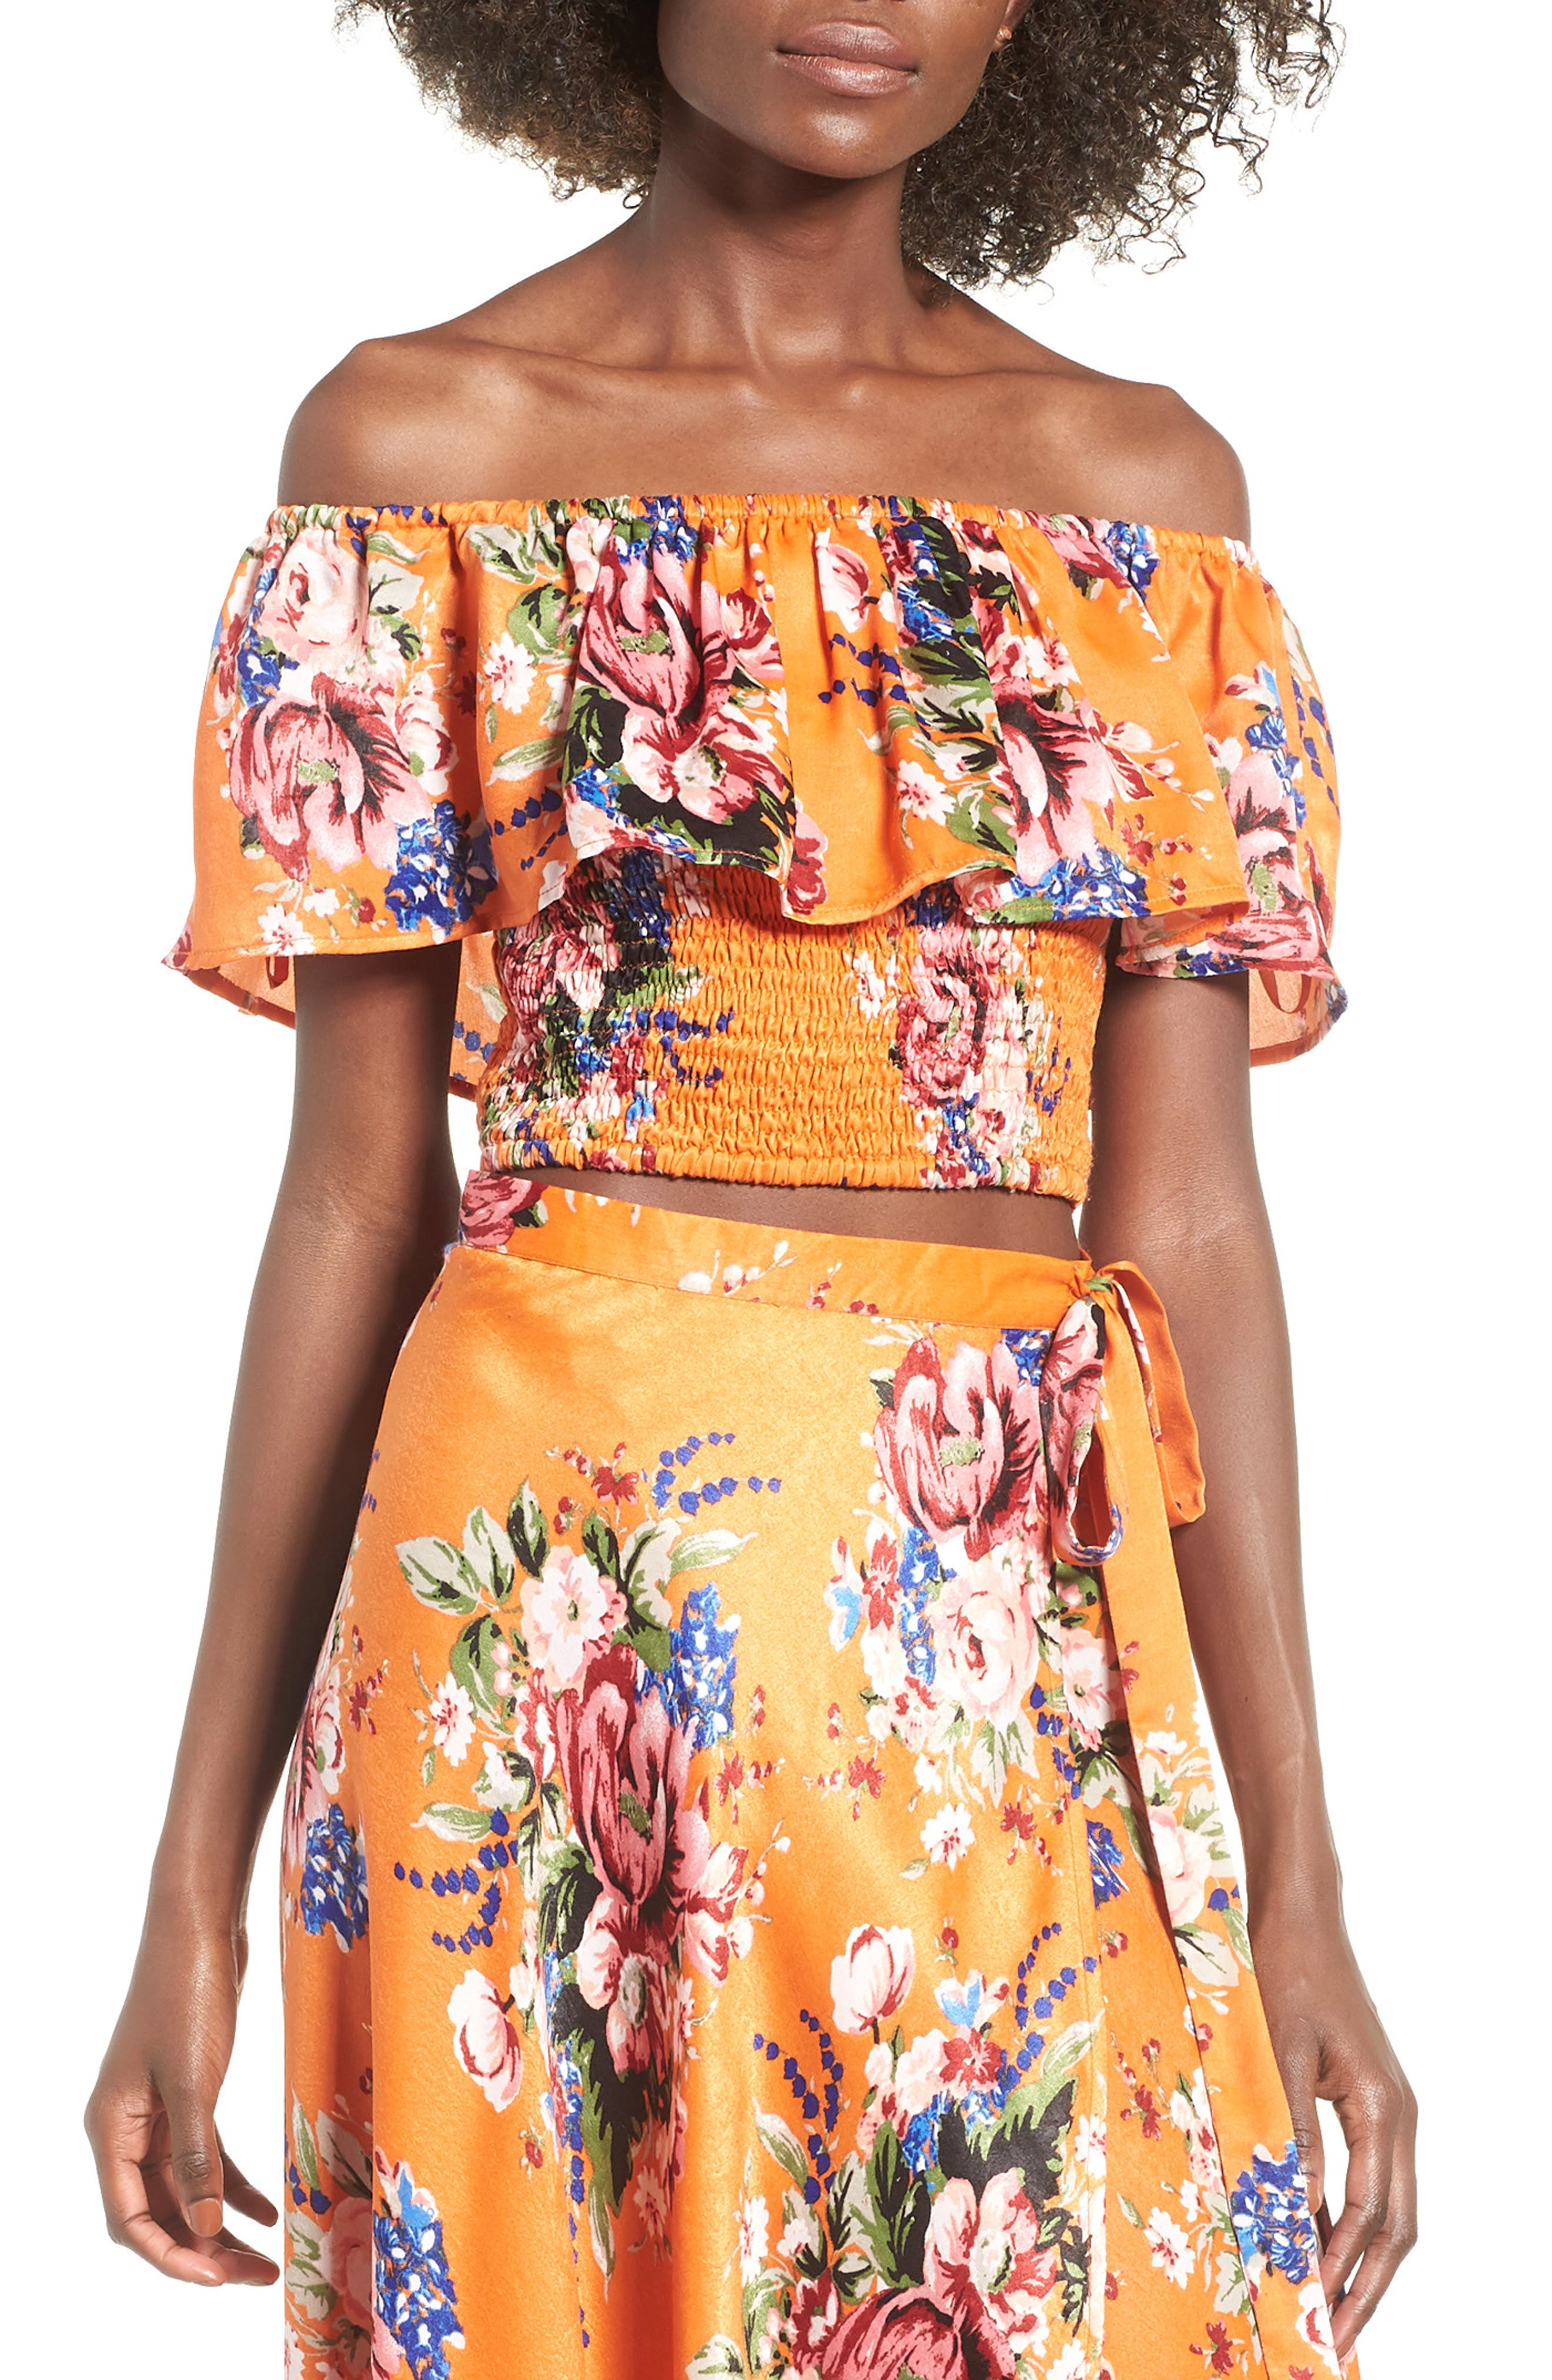 Lulu Off the Shoulder Crop Top,                             Main thumbnail 1, color,                             Orange Rose